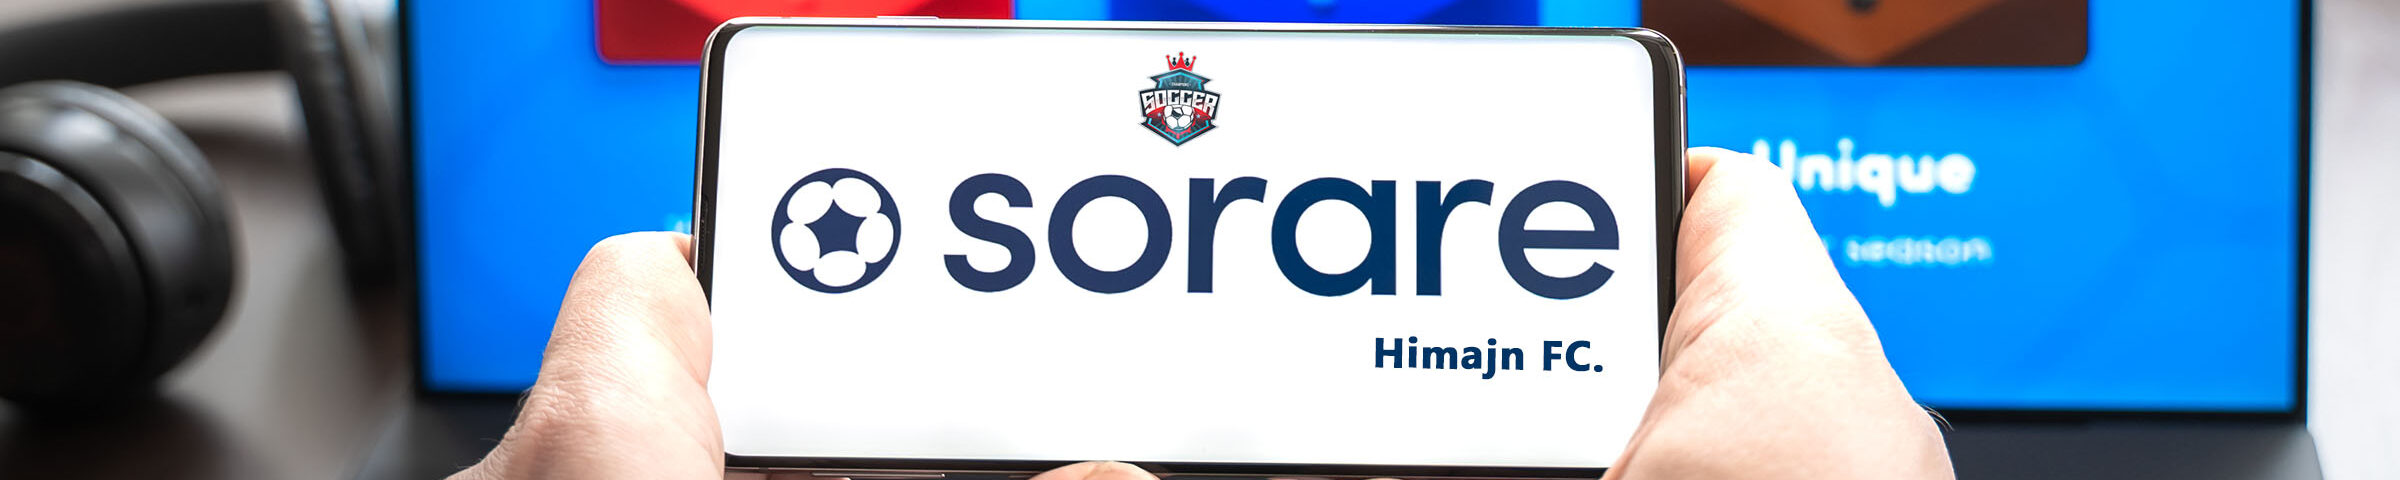 sorare_header_sp